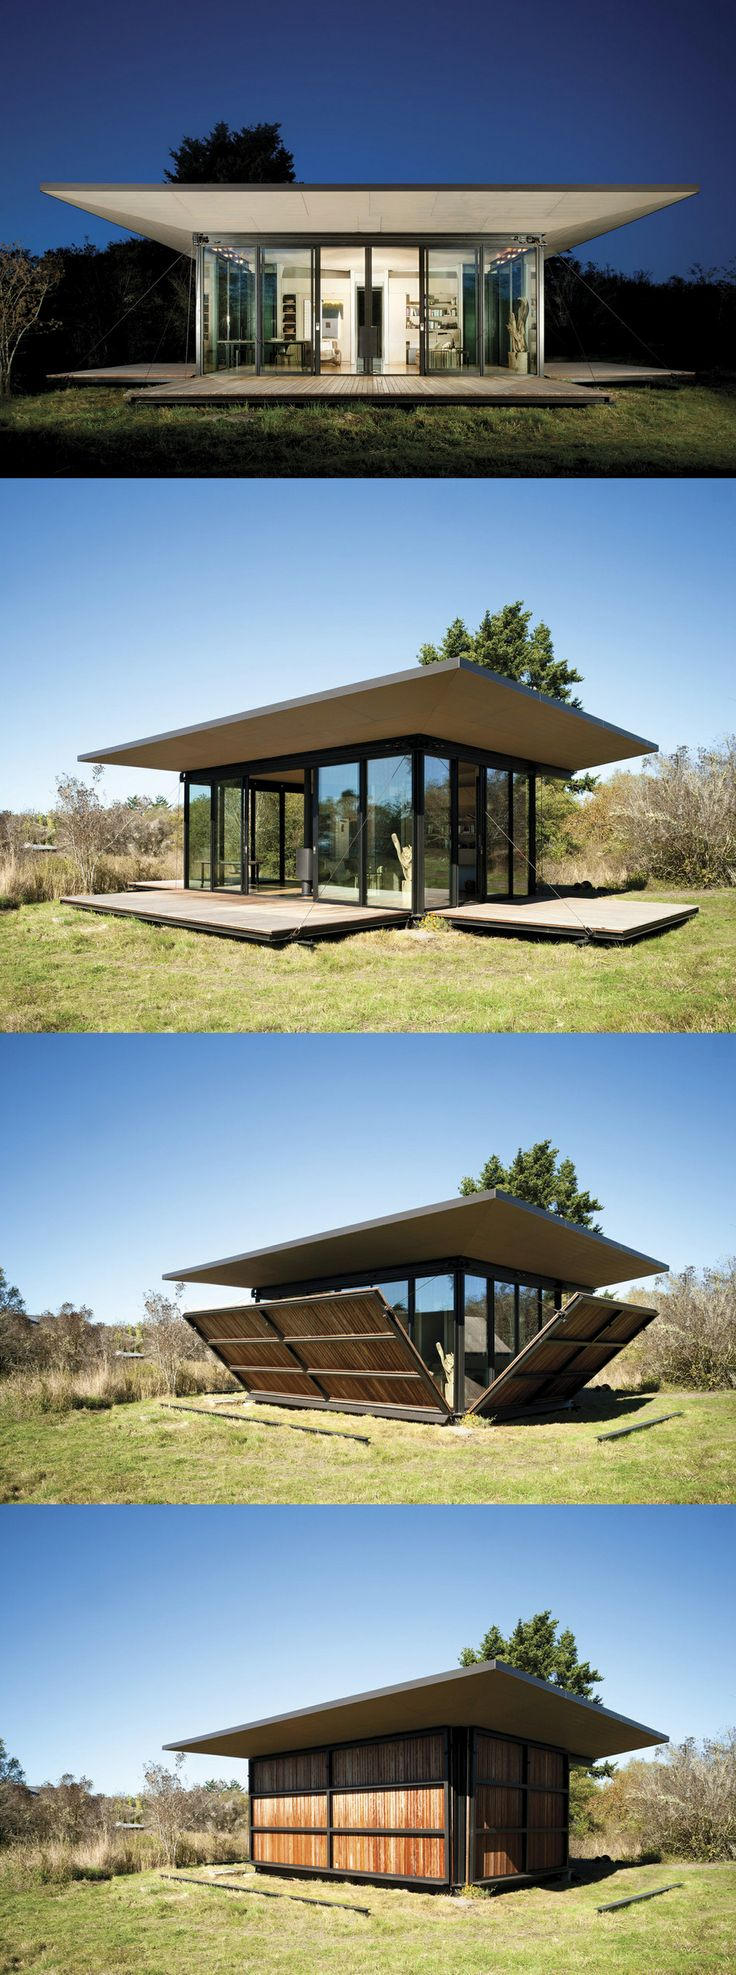 Design Workshop: Kinetic Architecture http://www.houzz.com/